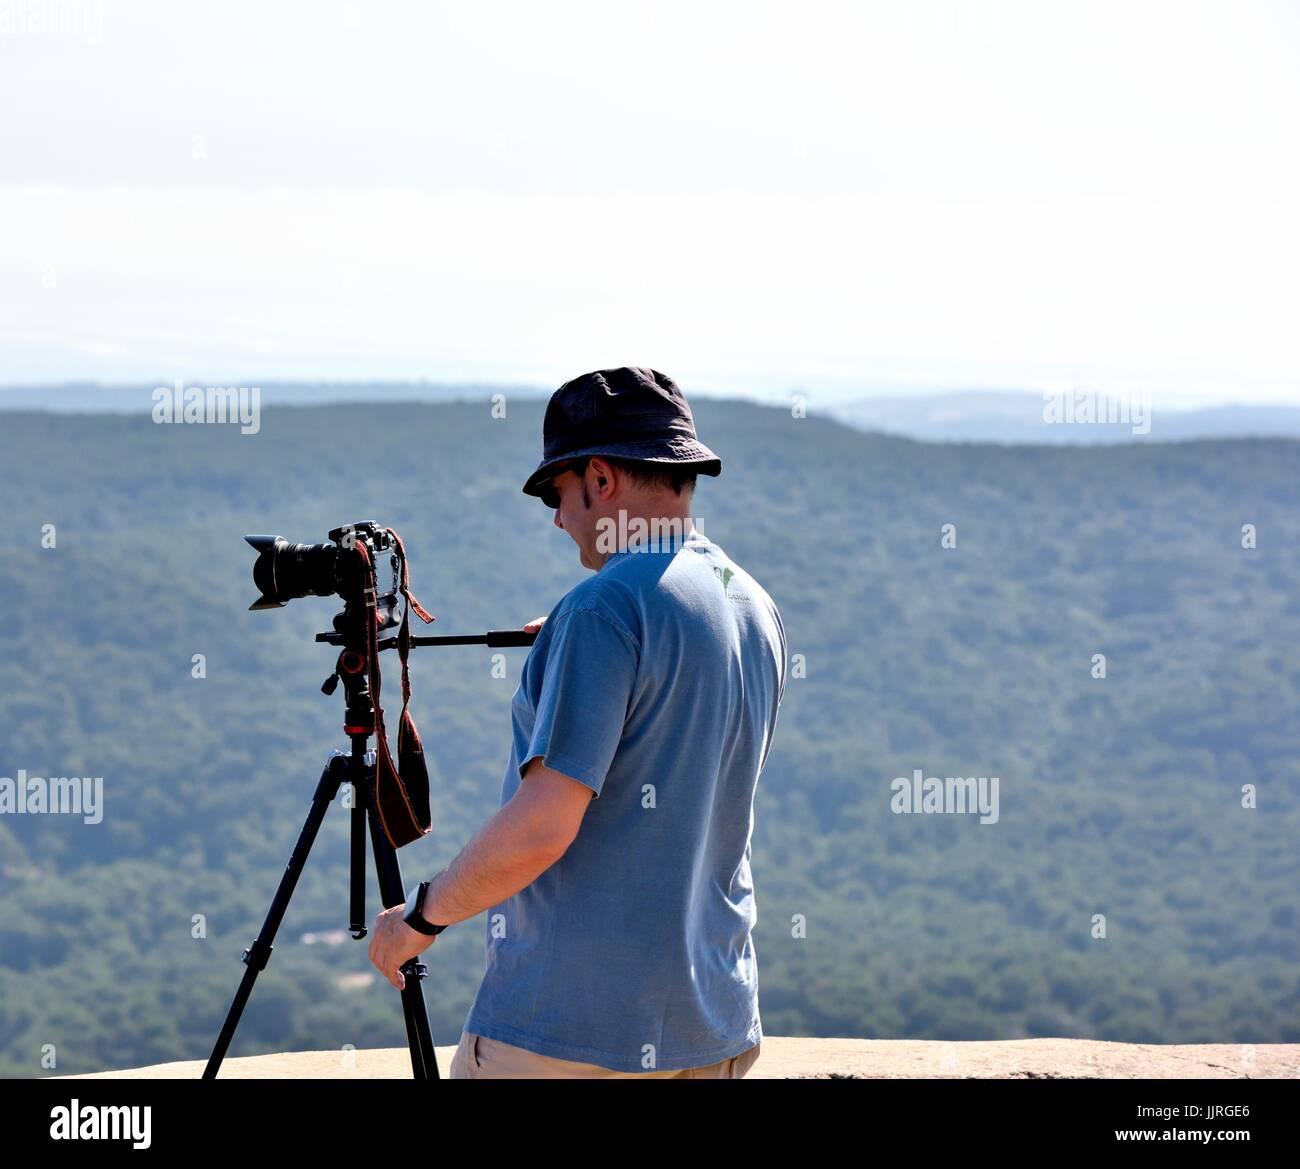 Hombre con cámara digital SLR en un trípode Imagen De Stock